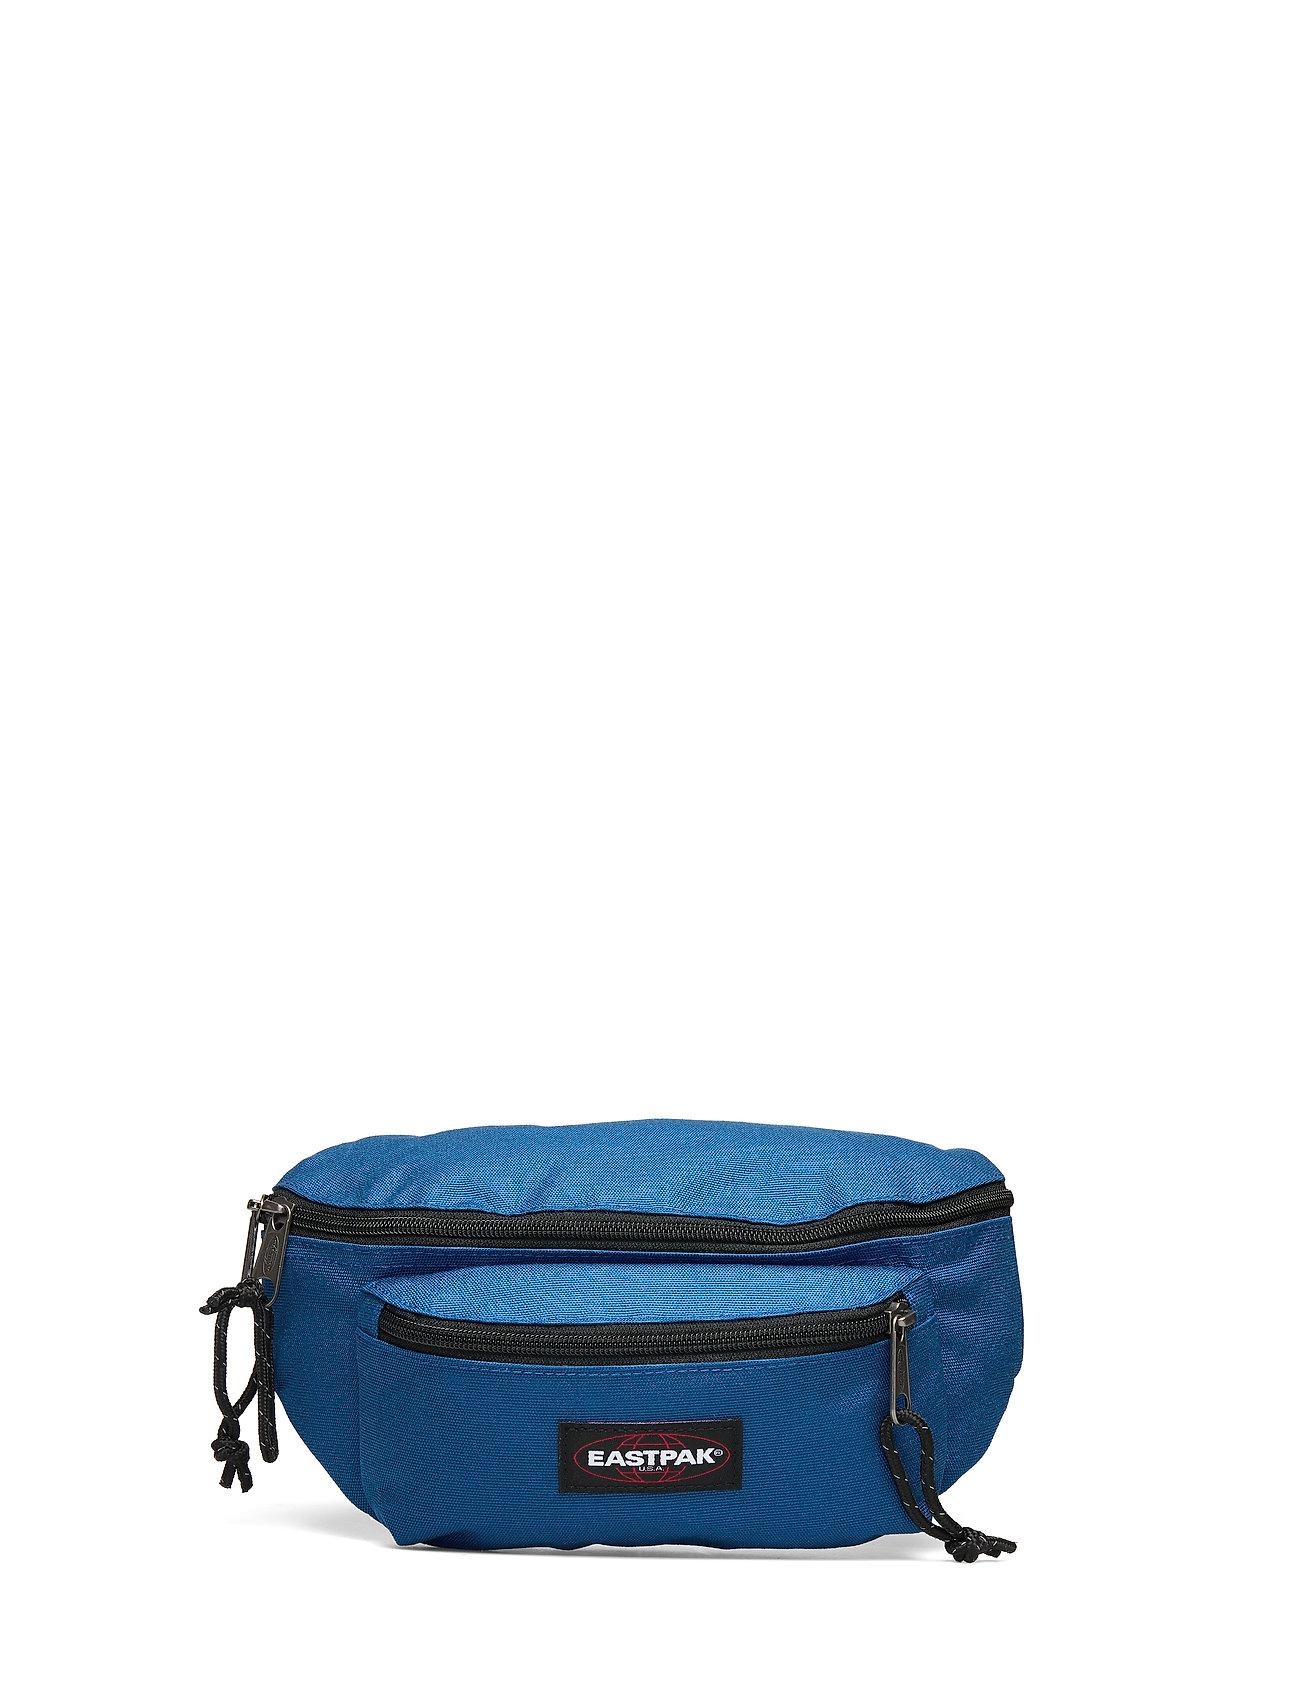 Eastpak Doggy Bag - URBAN BLUE